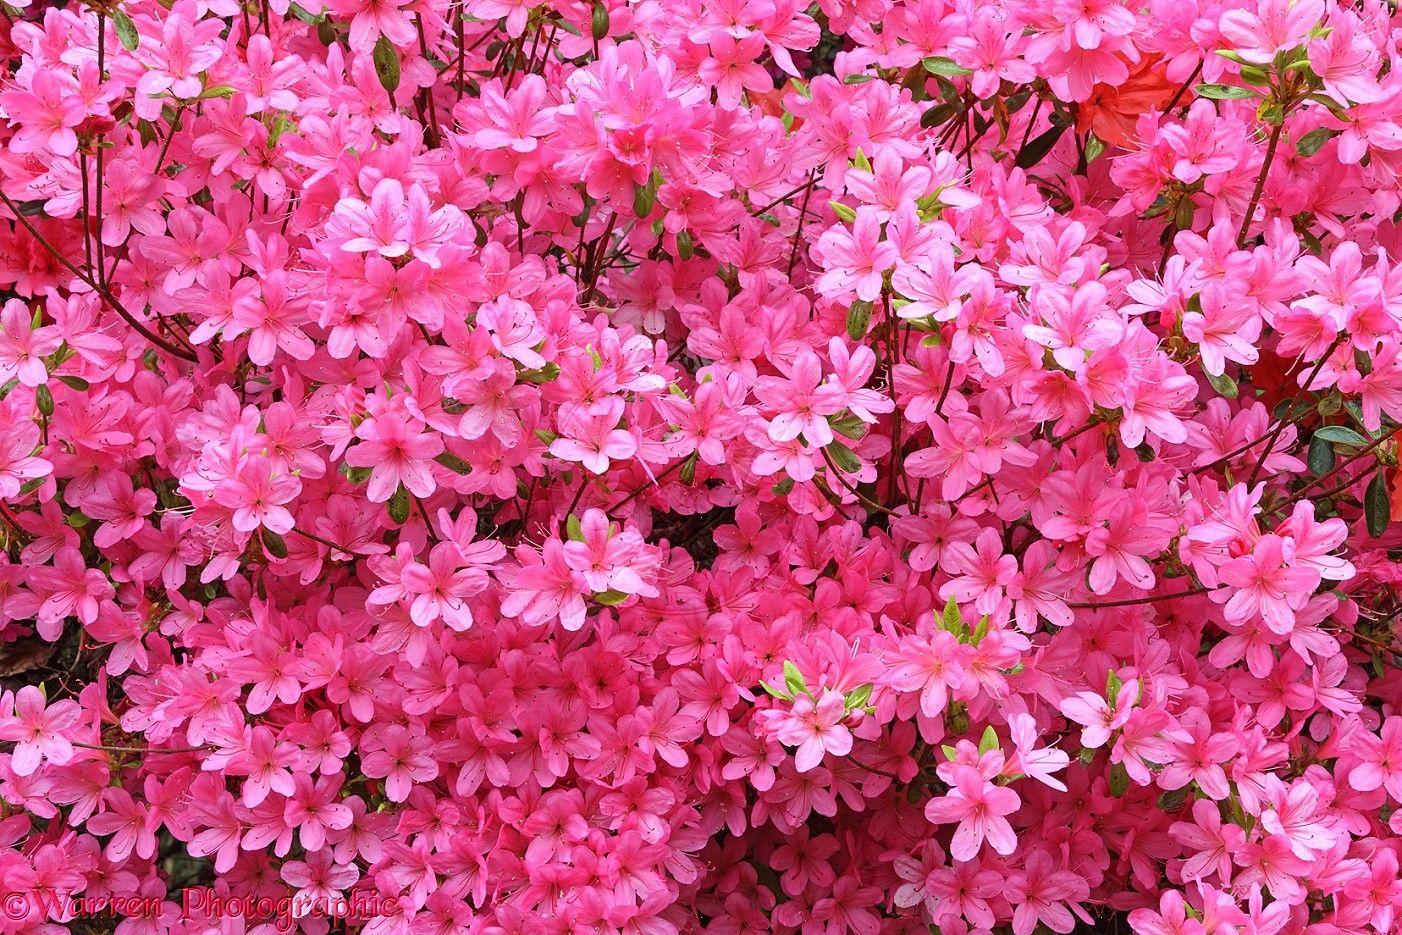 100 flowers pink best 25 pink daisy ideas on pinterest pink